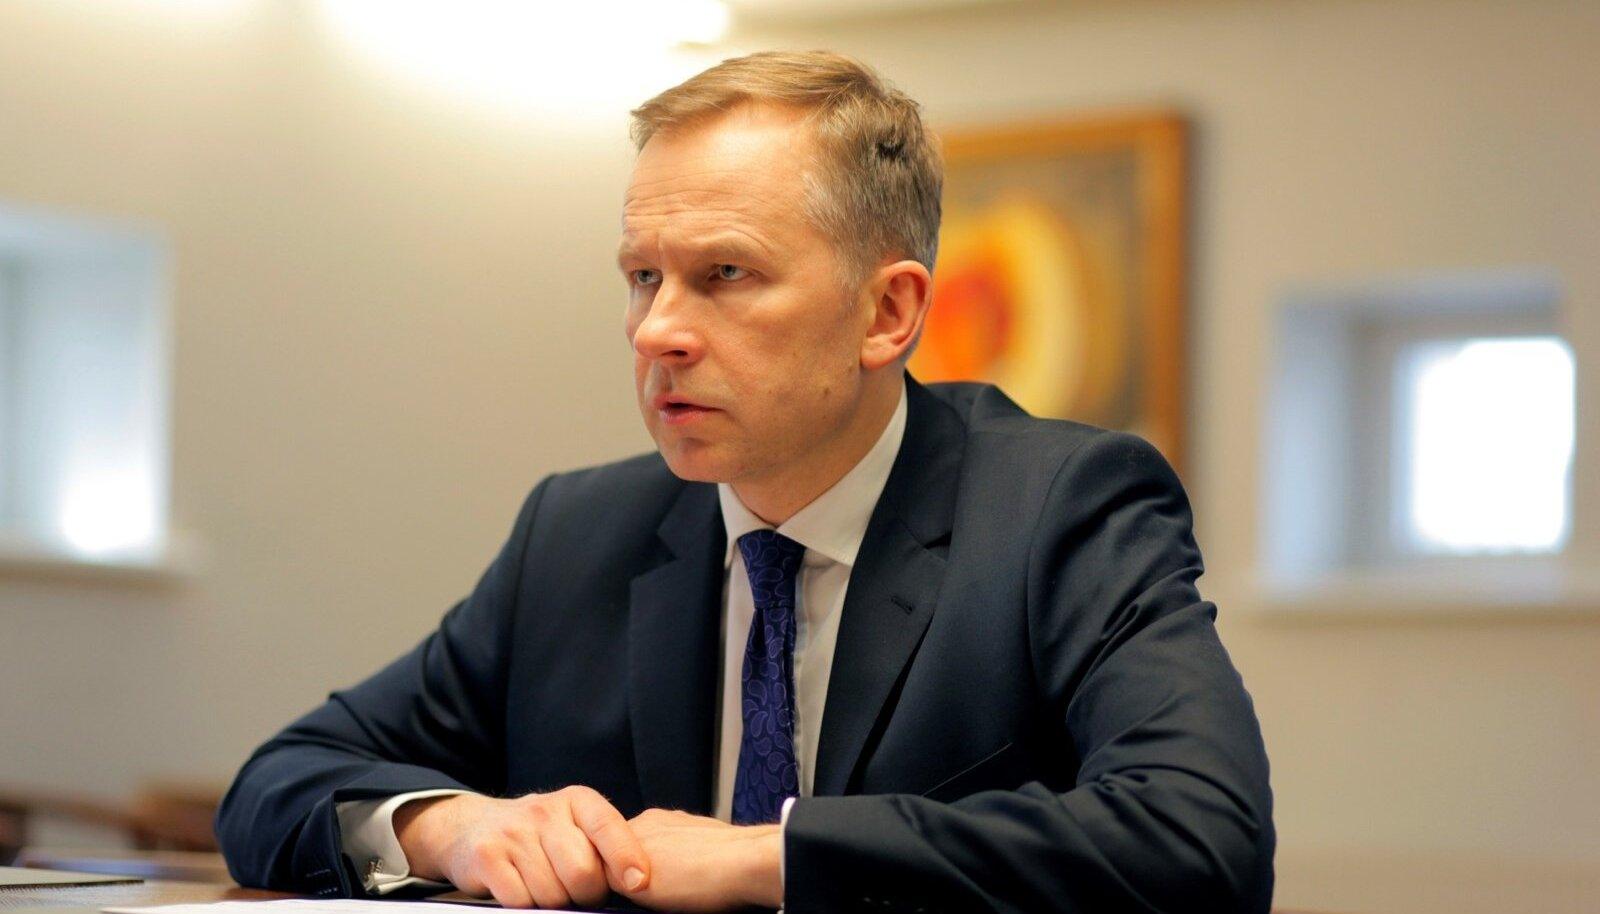 To match interview LATVIA-ECONOMY/